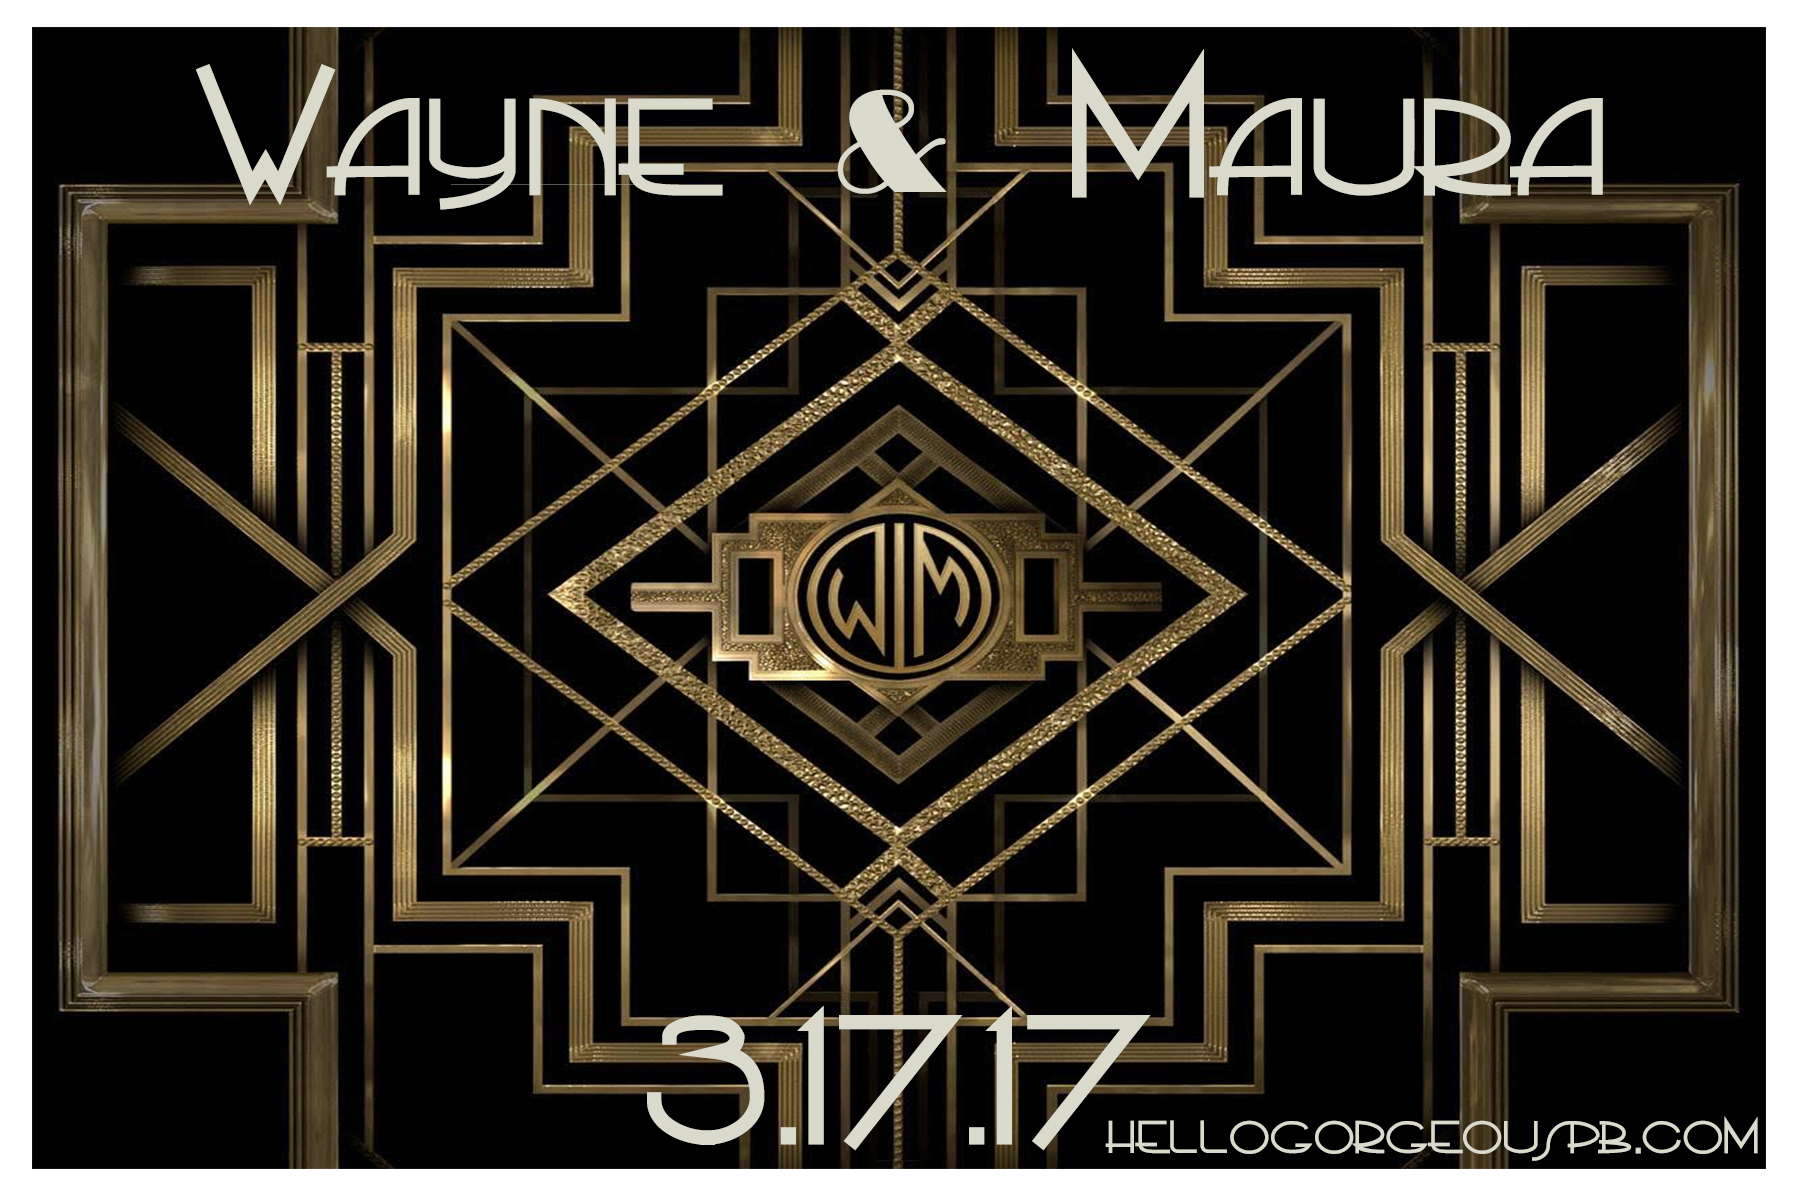 Wayne & Maura